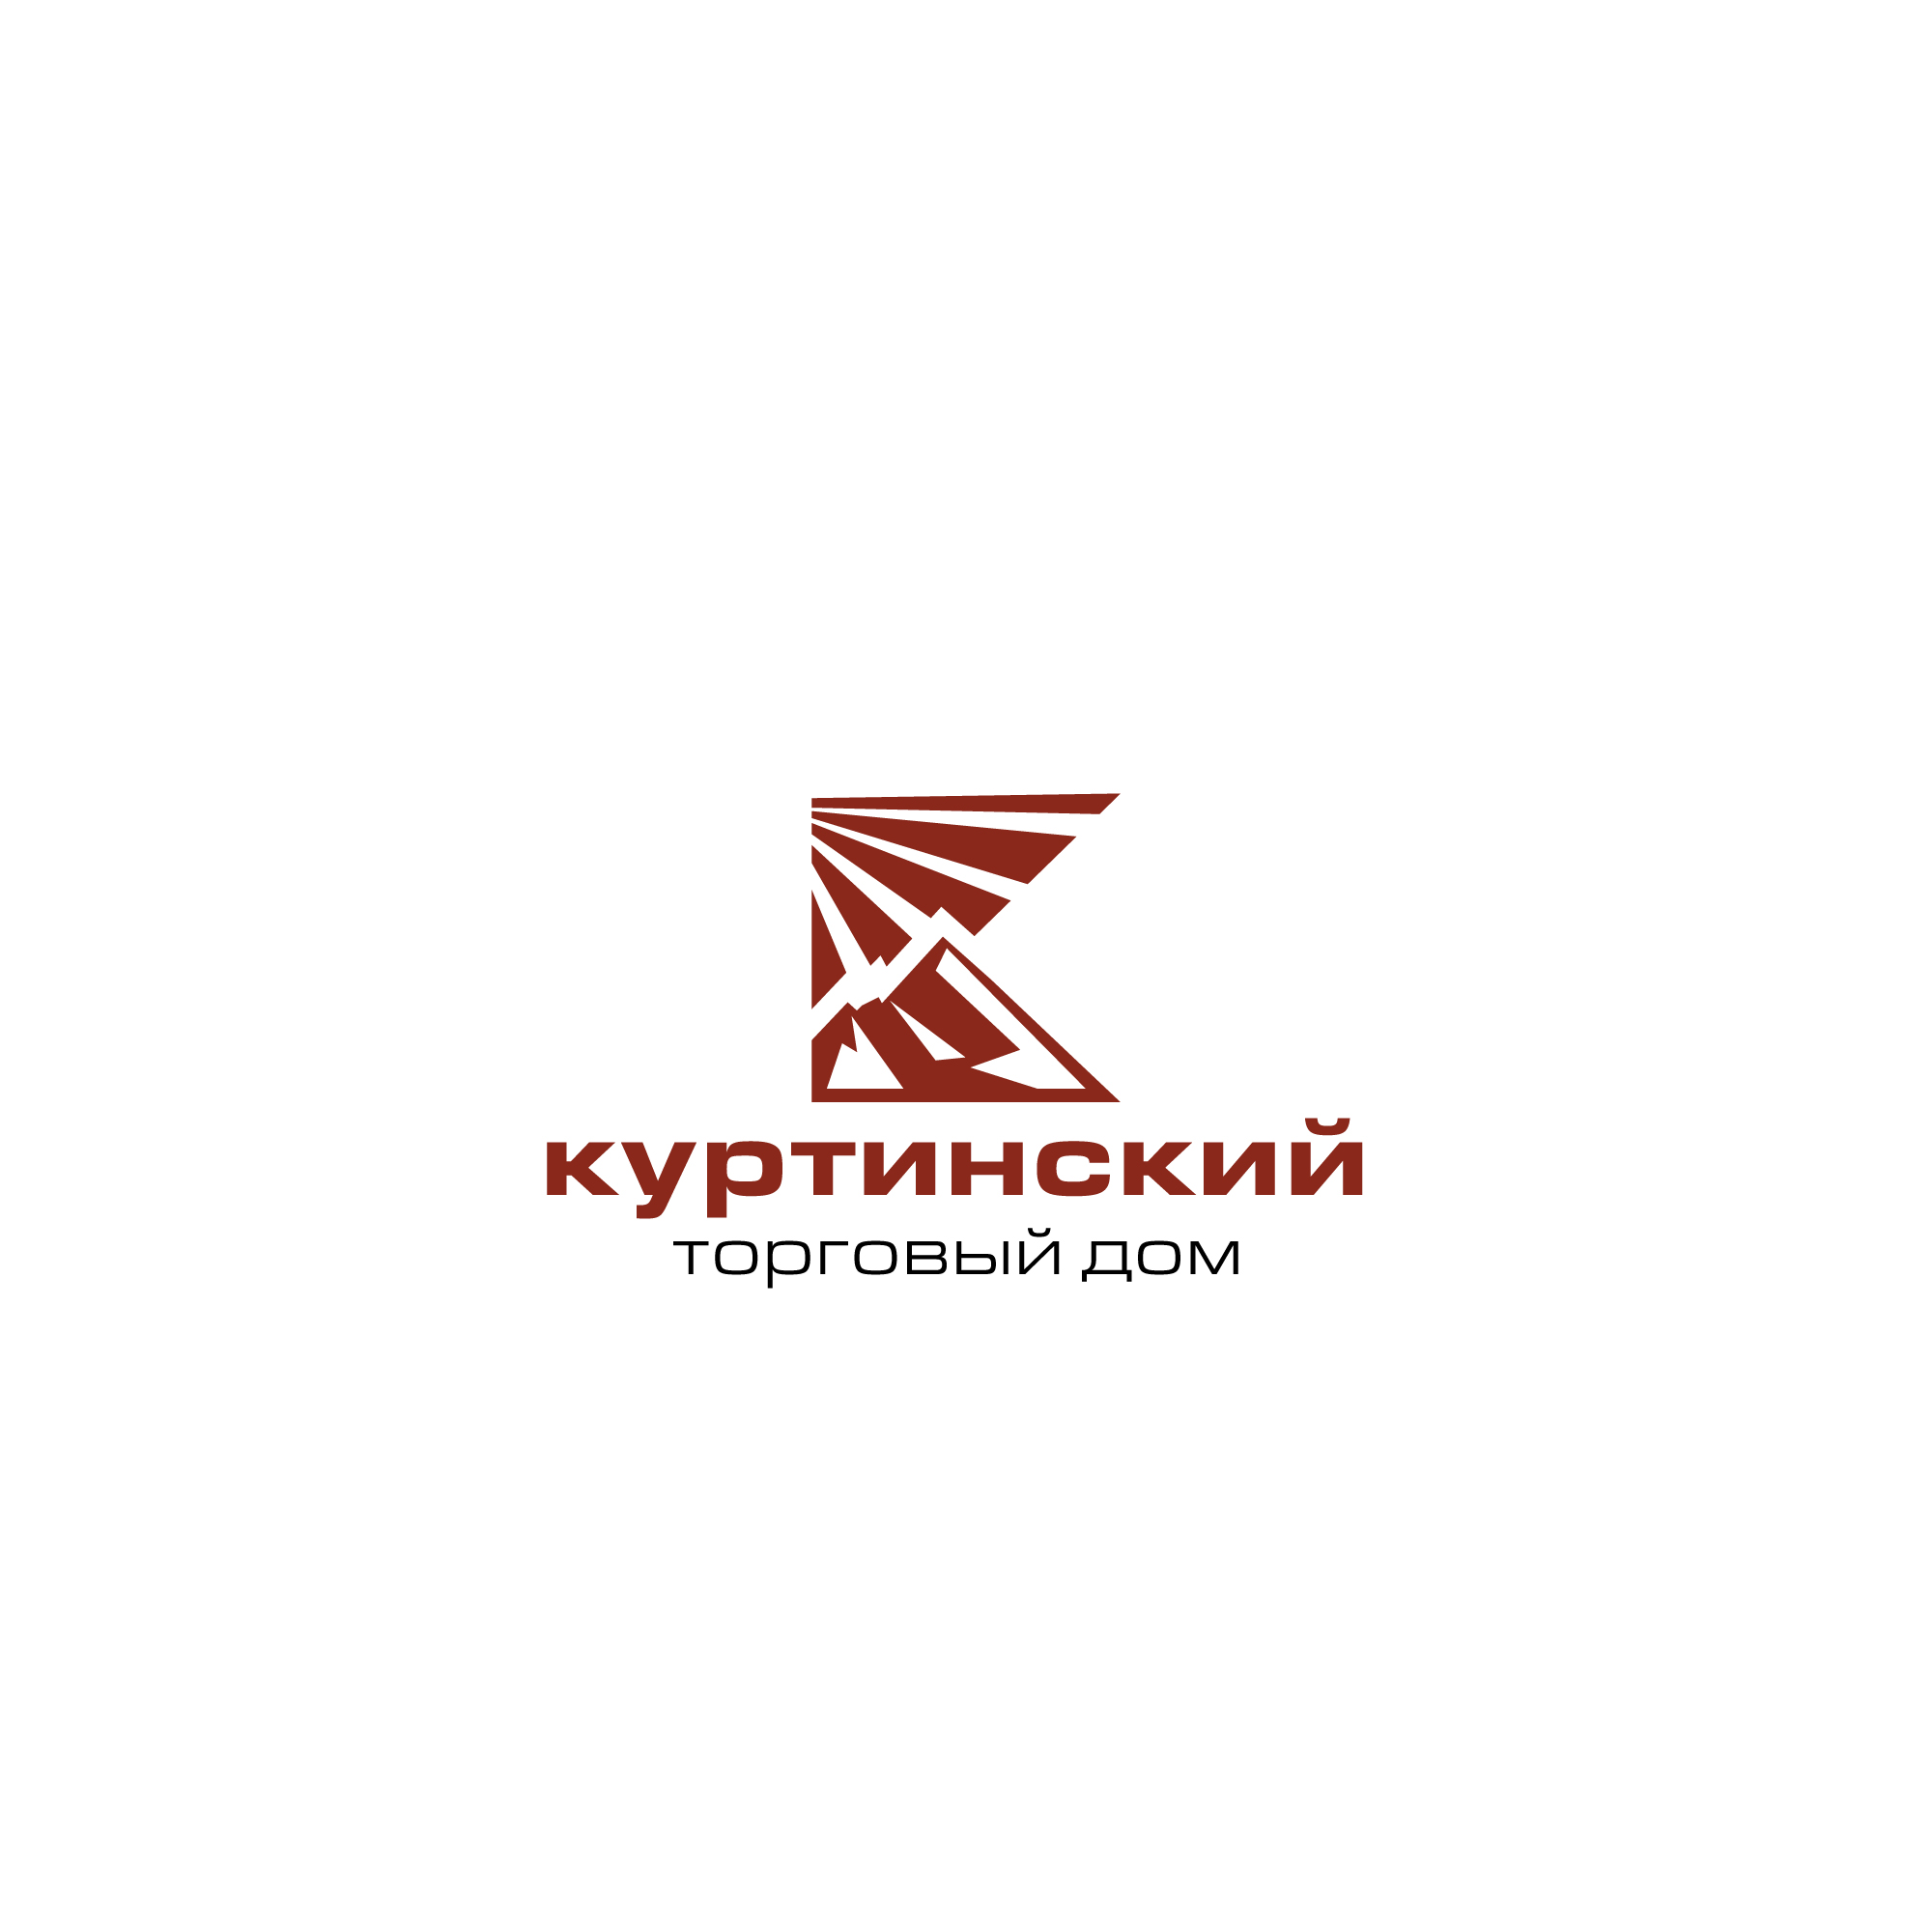 Логотип для камнедобывающей компании фото f_0255b9938a5d8c19.jpg